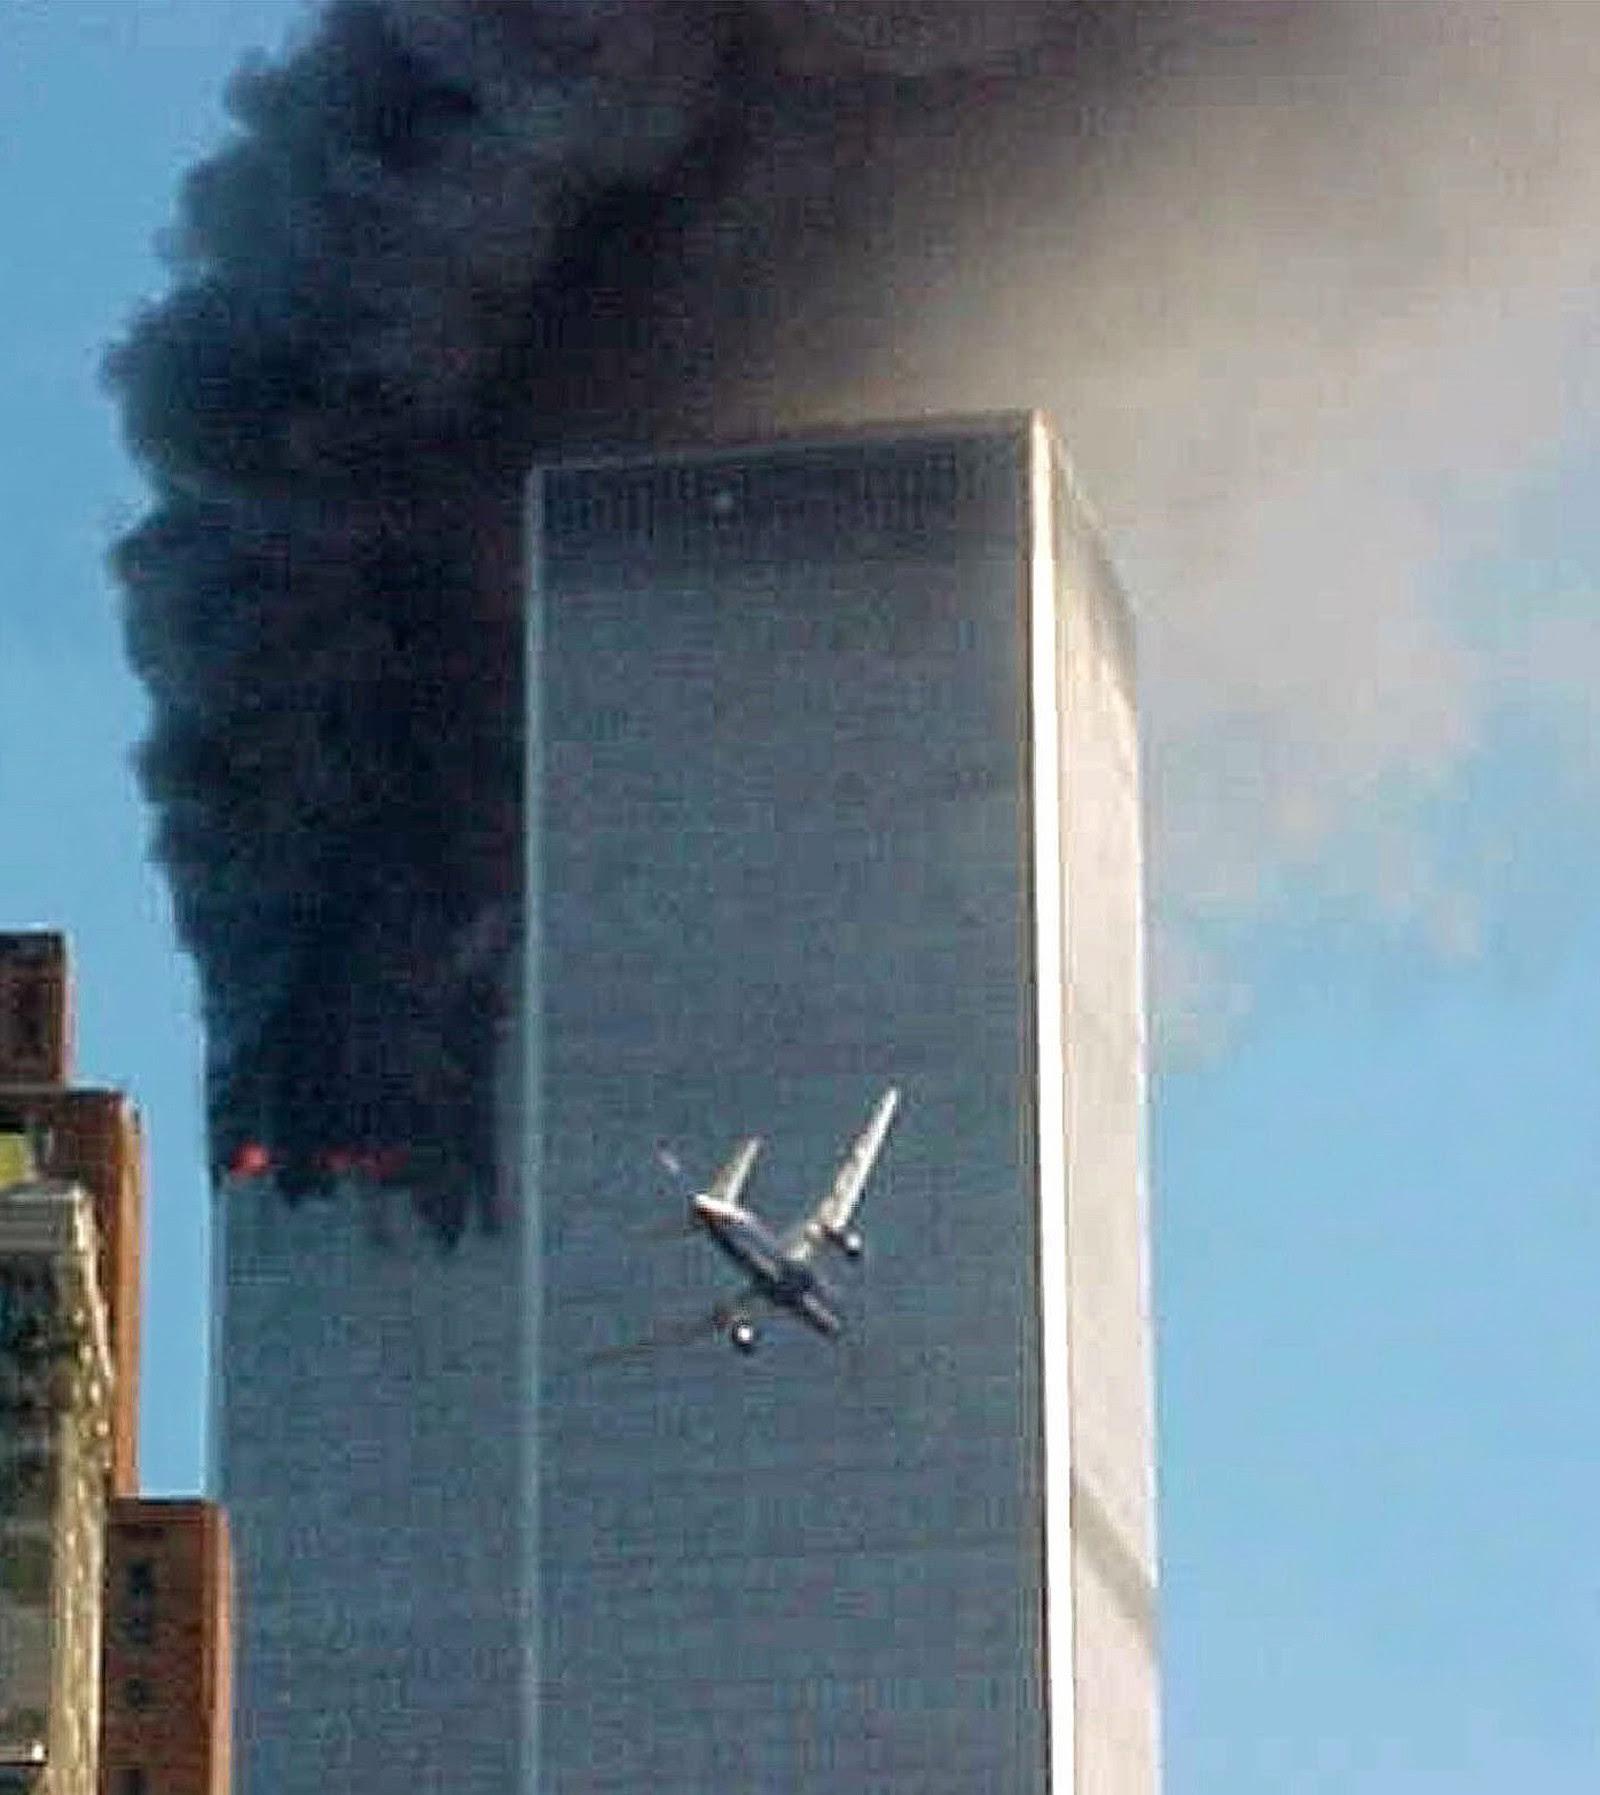 september 11 2001 attacks